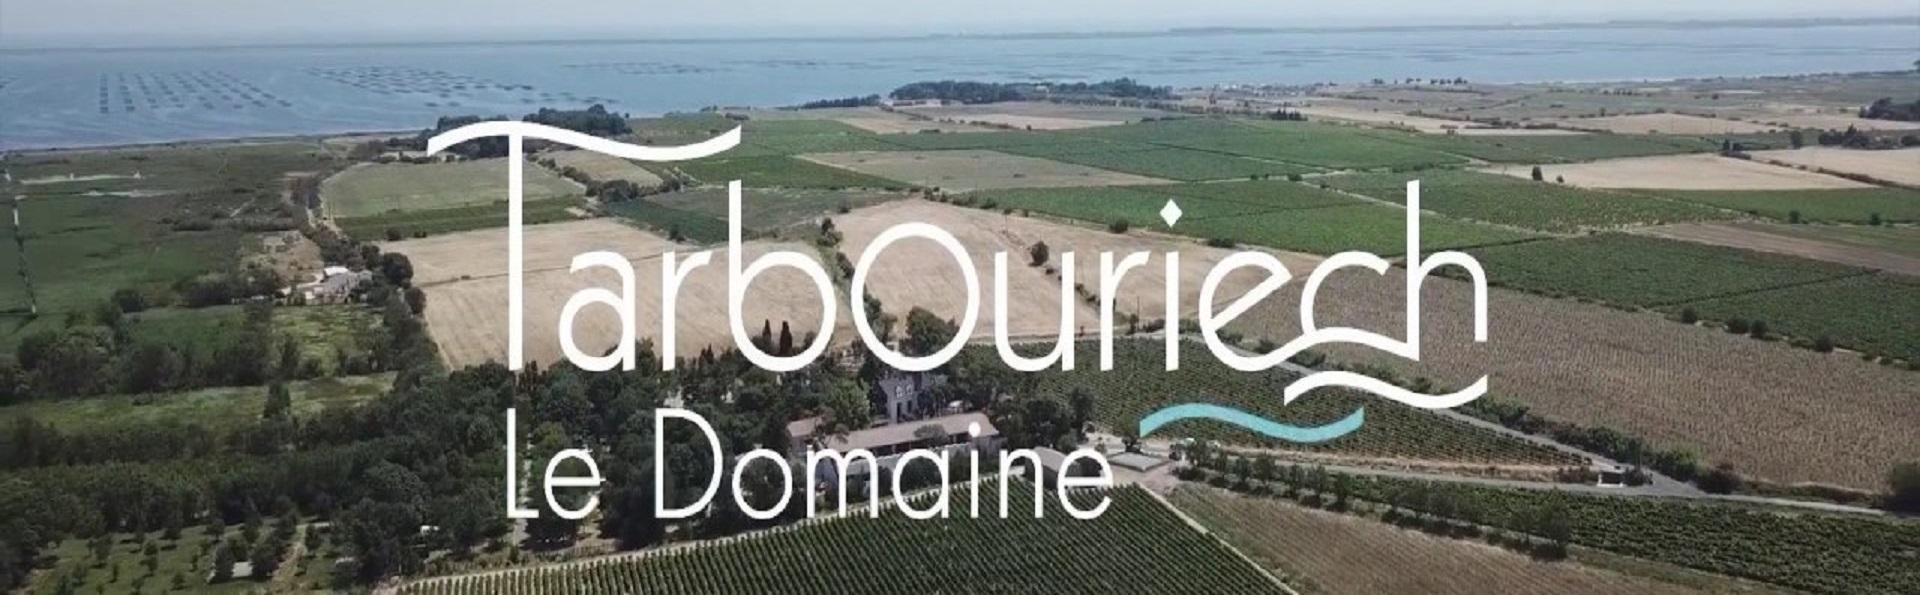 domaine-tarbouriech-herault-beziers-occitanie-seminaires-de-caractere-espaces